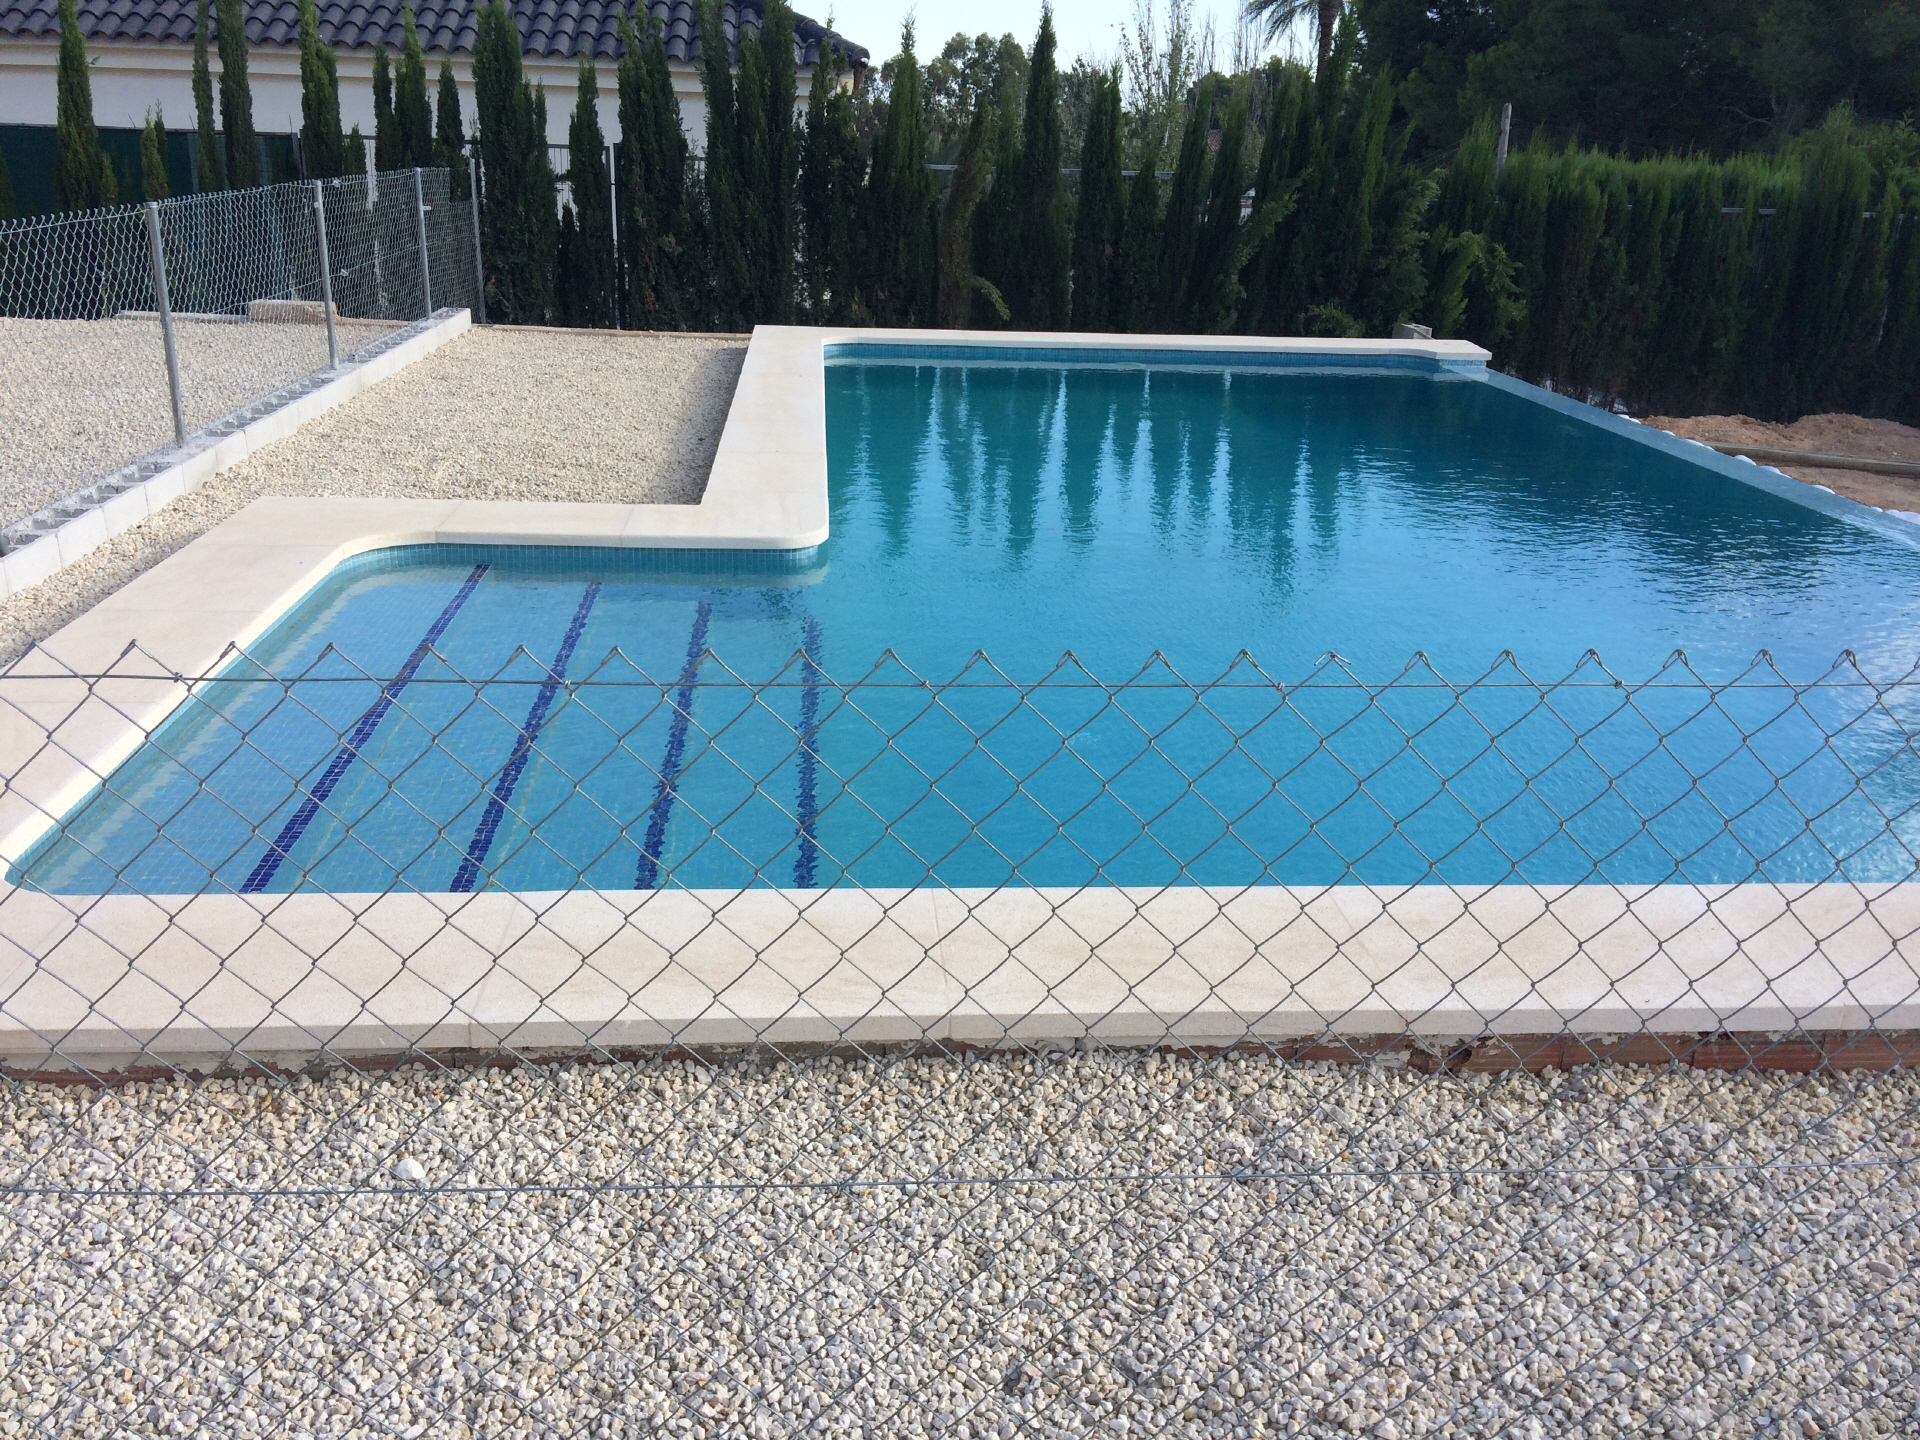 Precio de piscinas finest comprar piscina gre x serie for Precio construir piscina